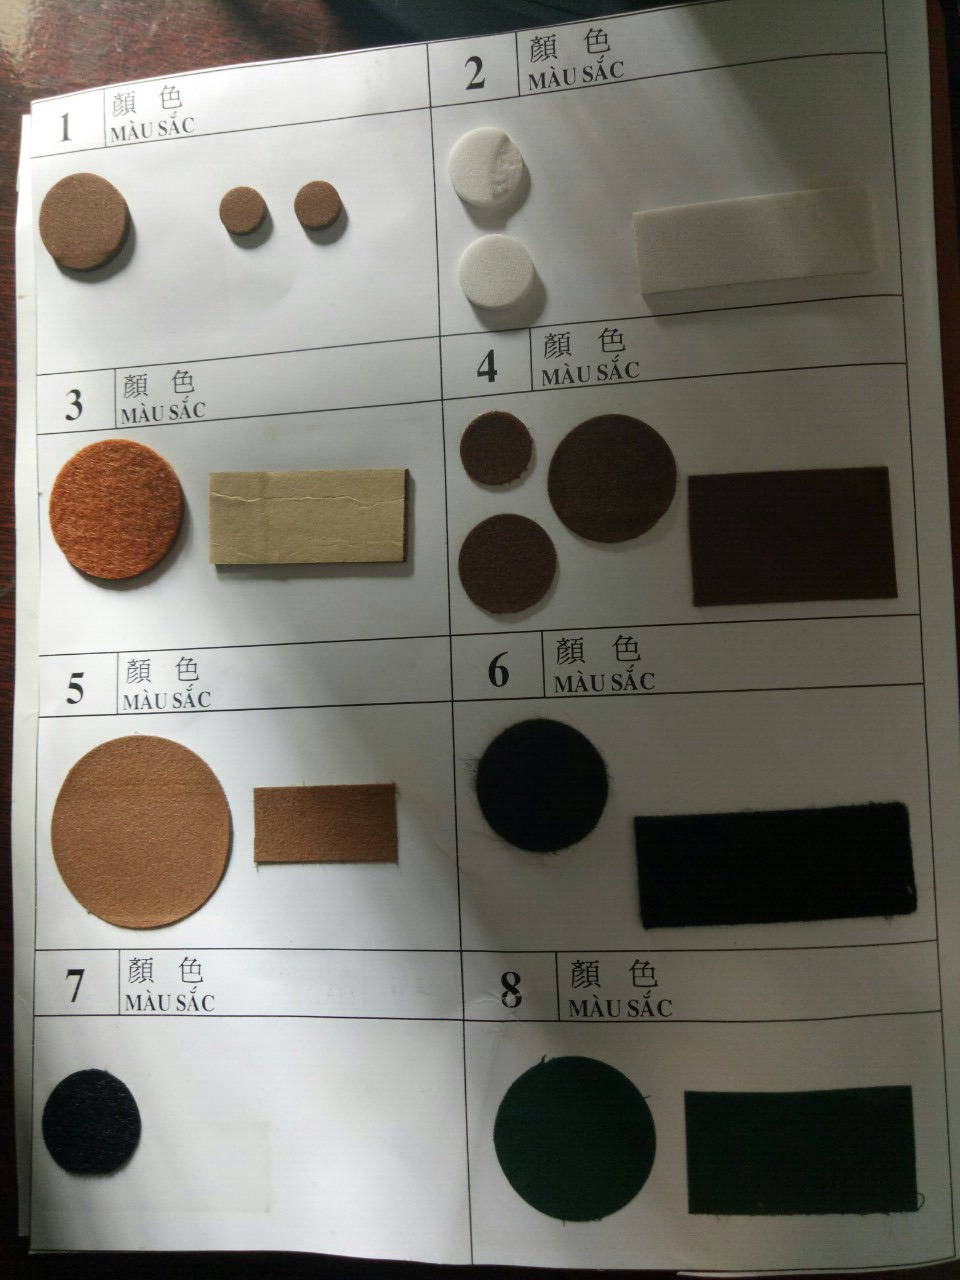 Sản phẩm mẫu